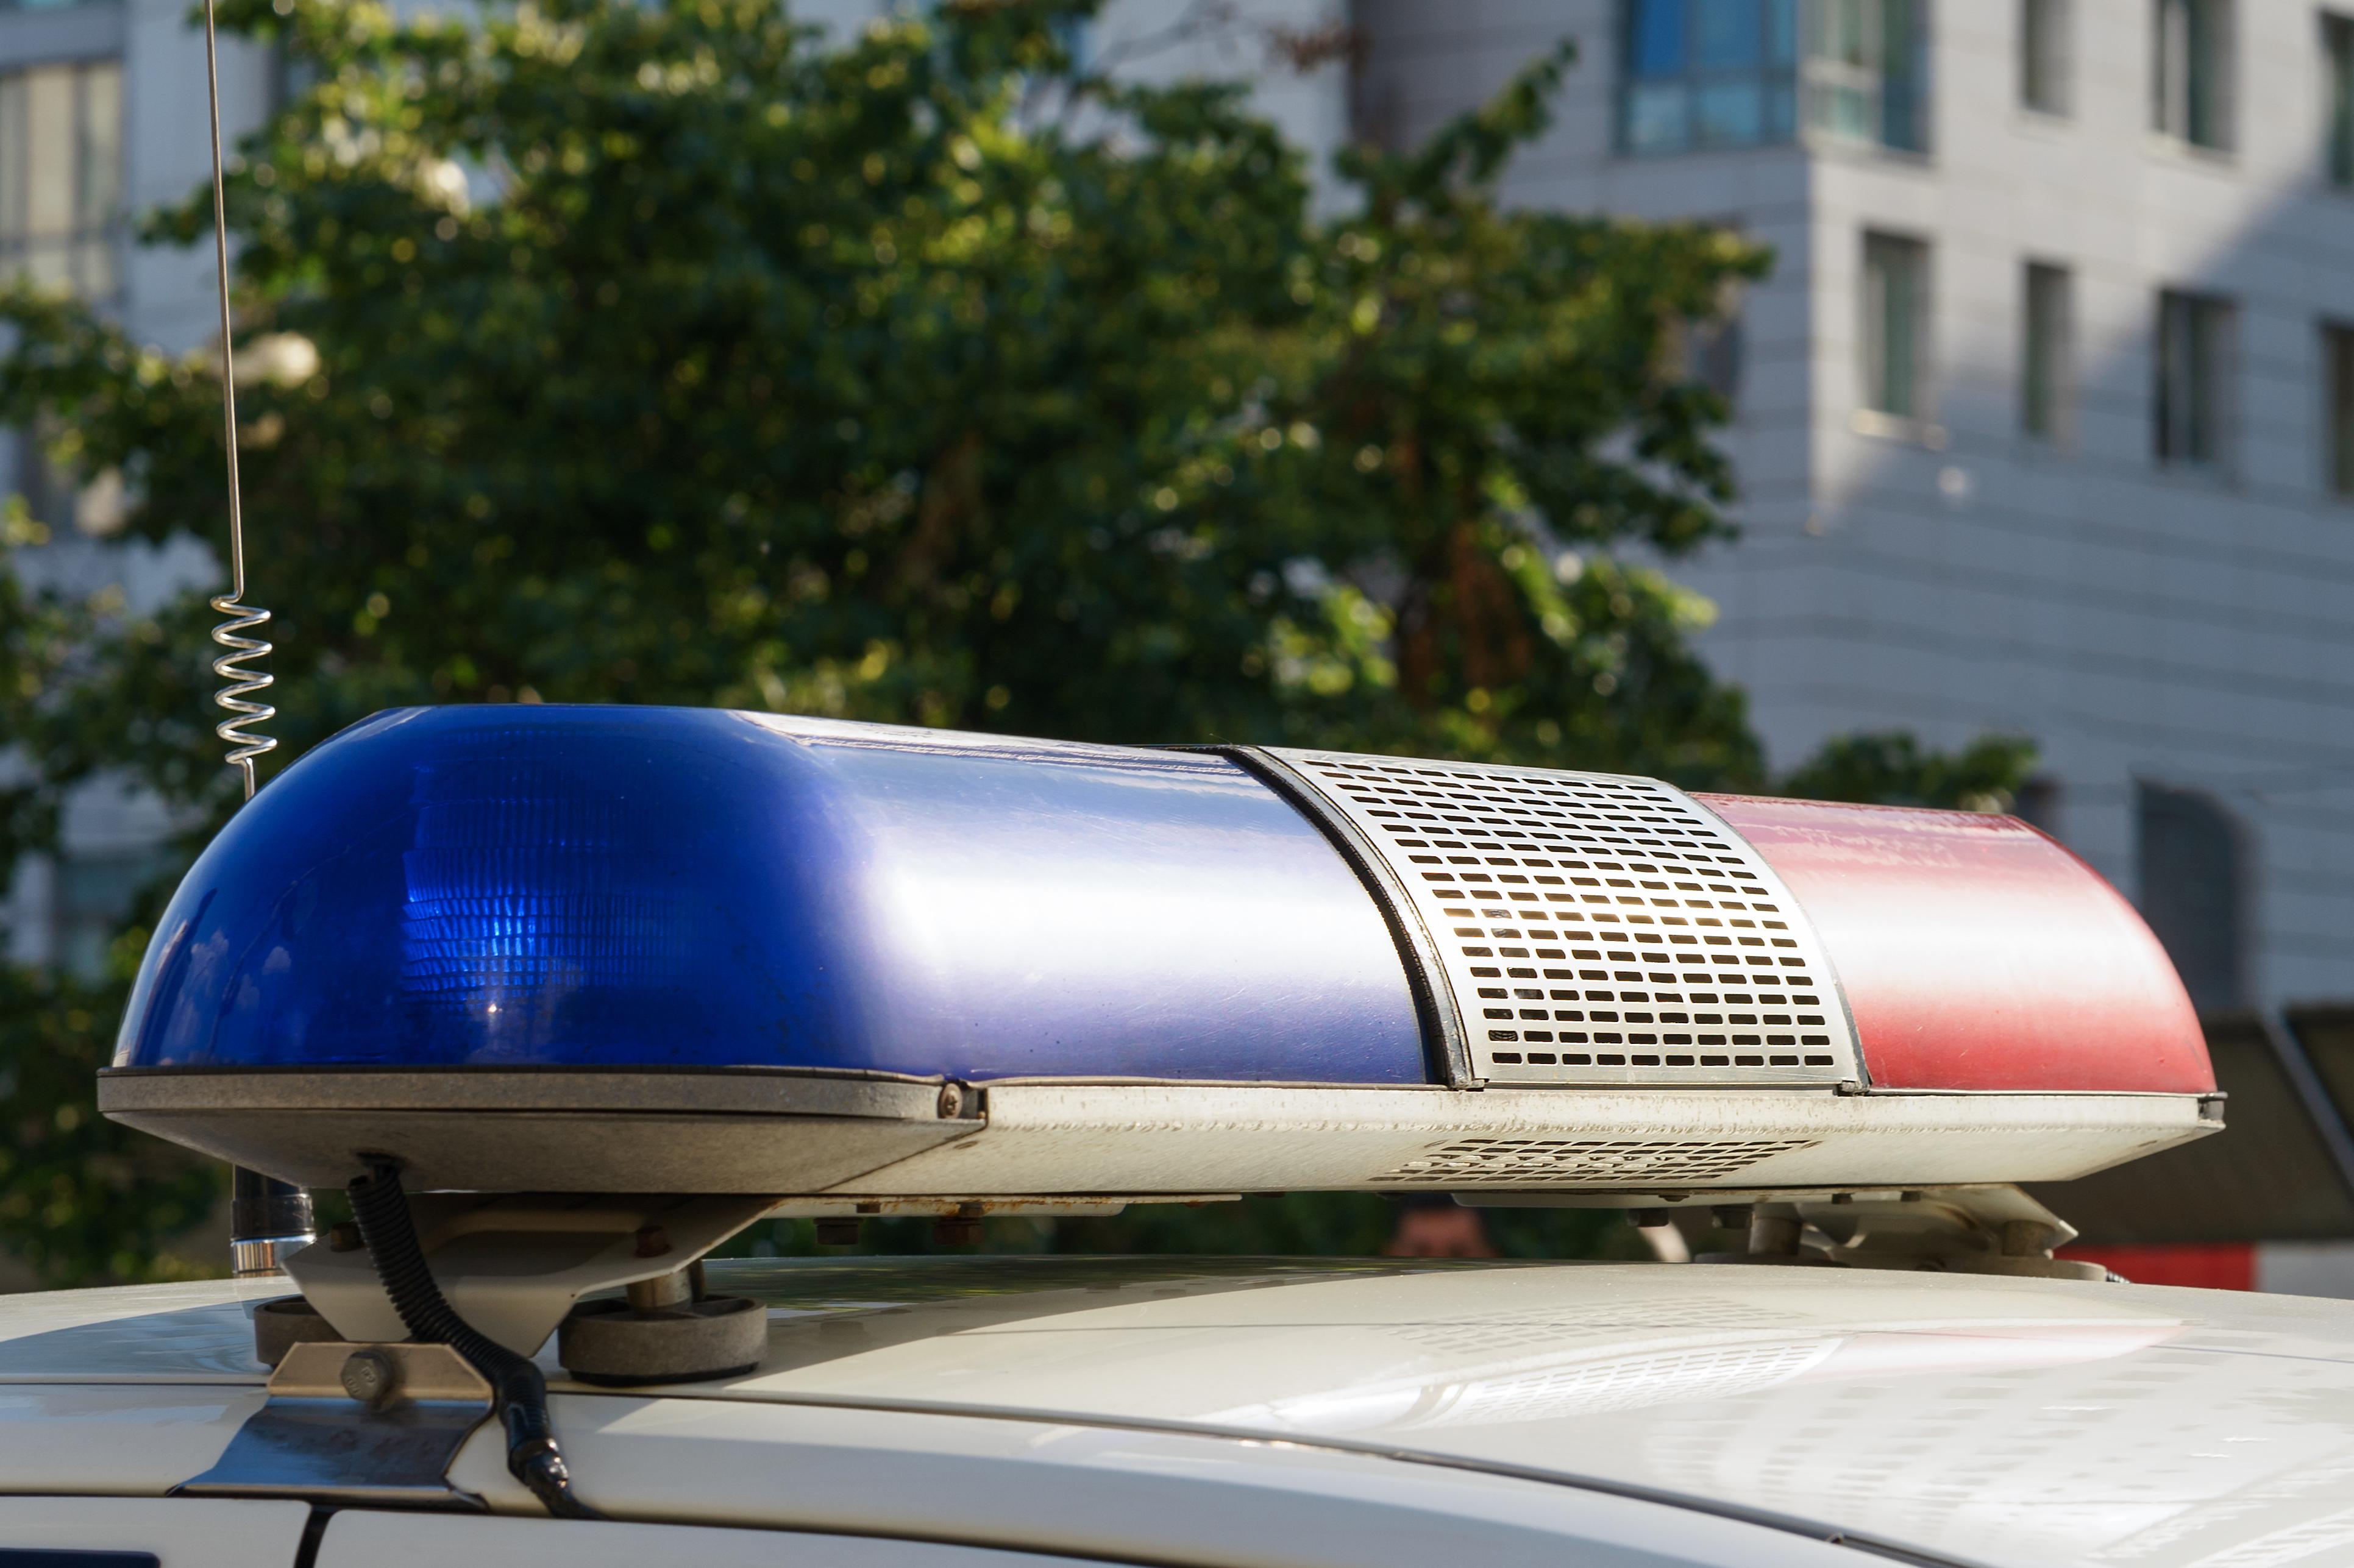 Арестуваха дрогиран шофьор след гонка в Слънчев бряг